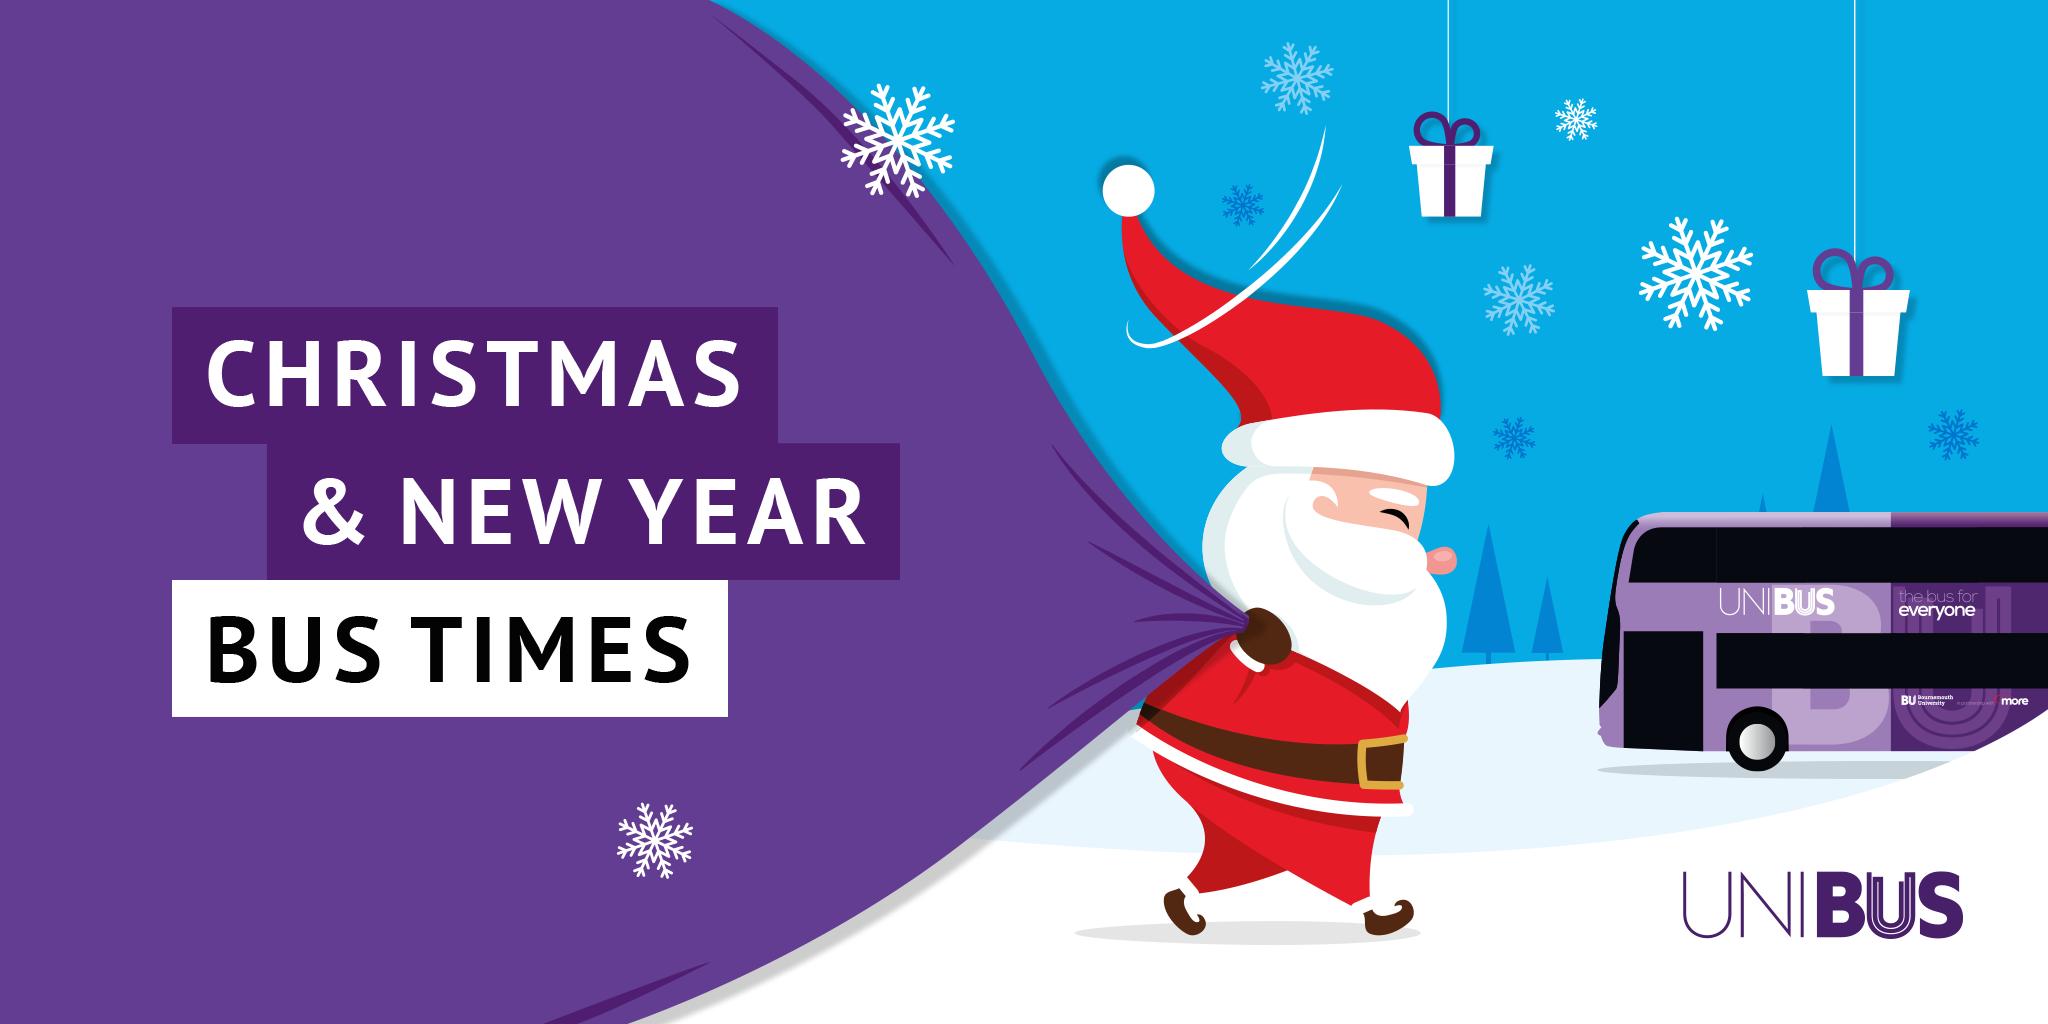 Image of Santa carrying his Christmas sack with text saying 'Christmas & New Year Bus Times'